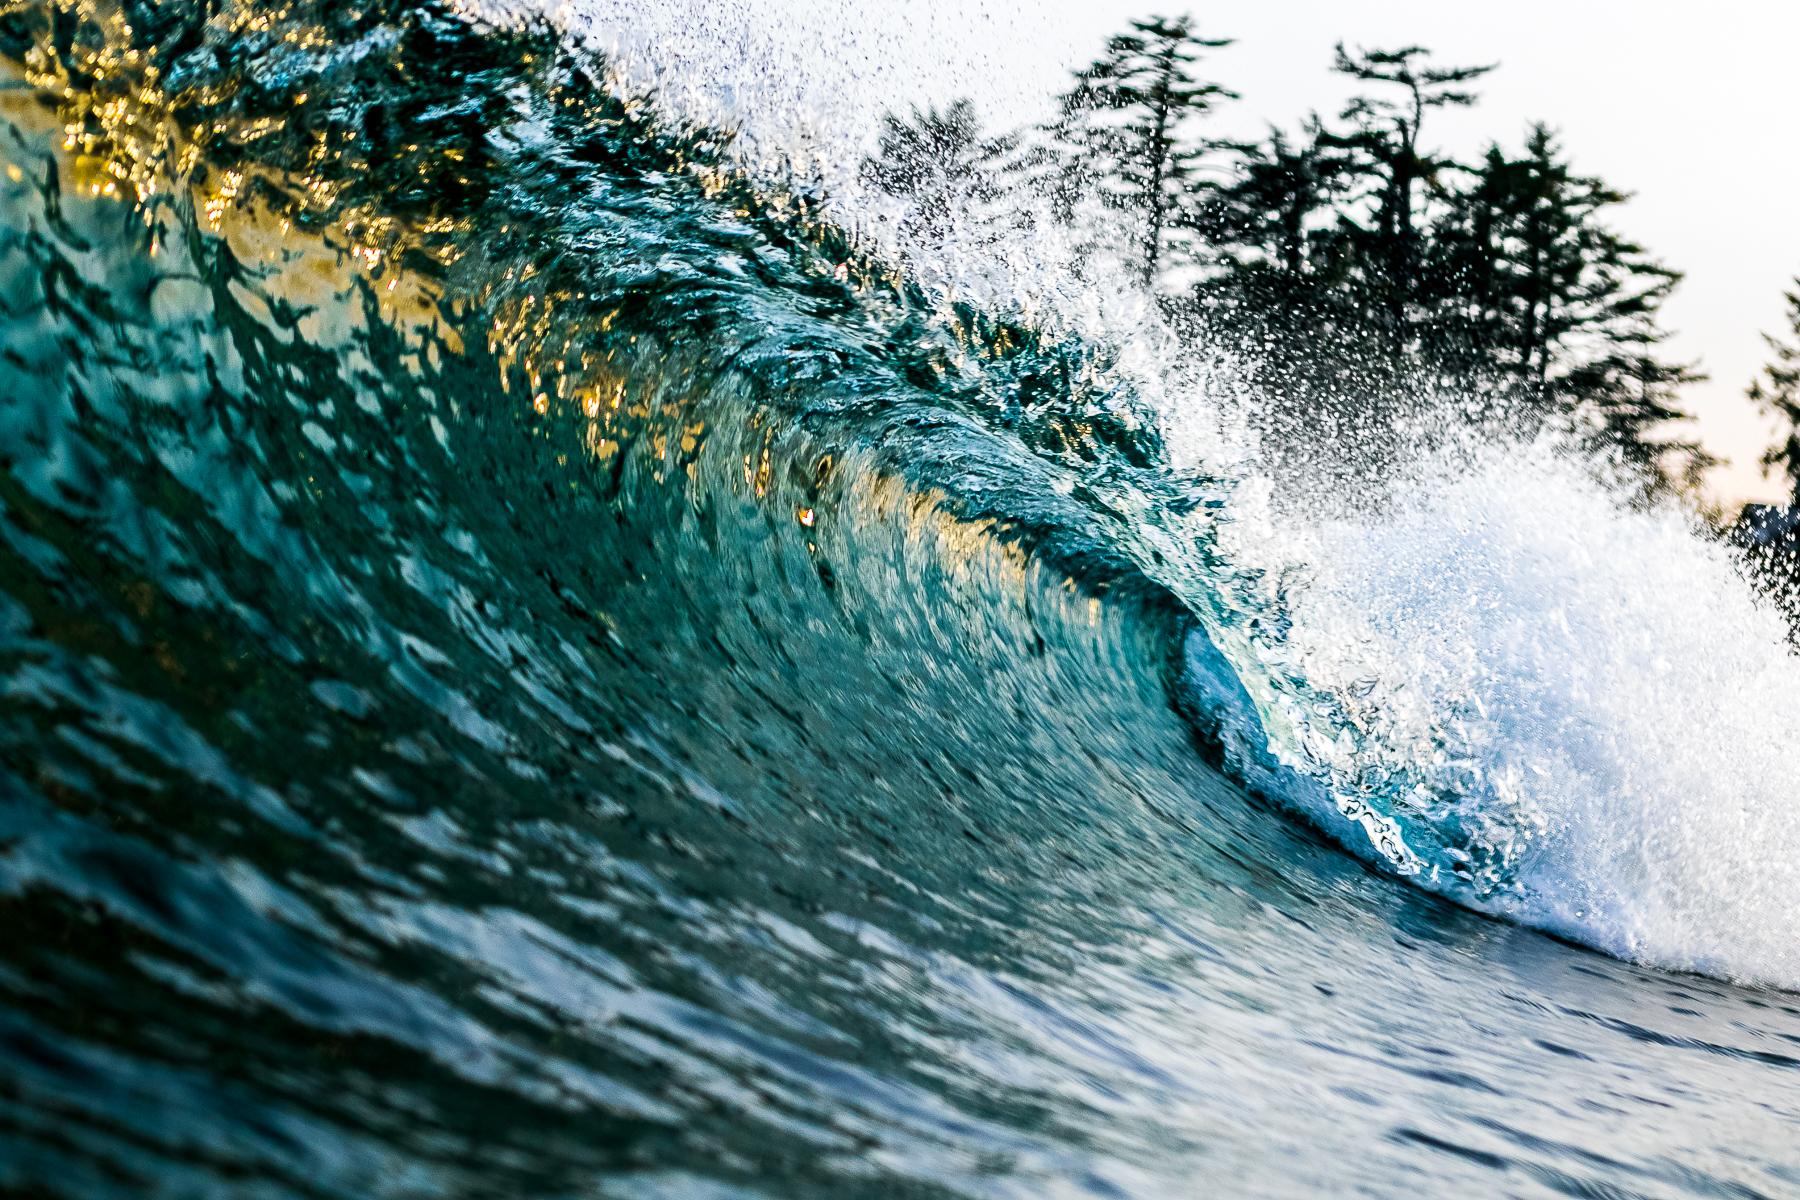 tofino_surf_photography-evening_gold.jpg